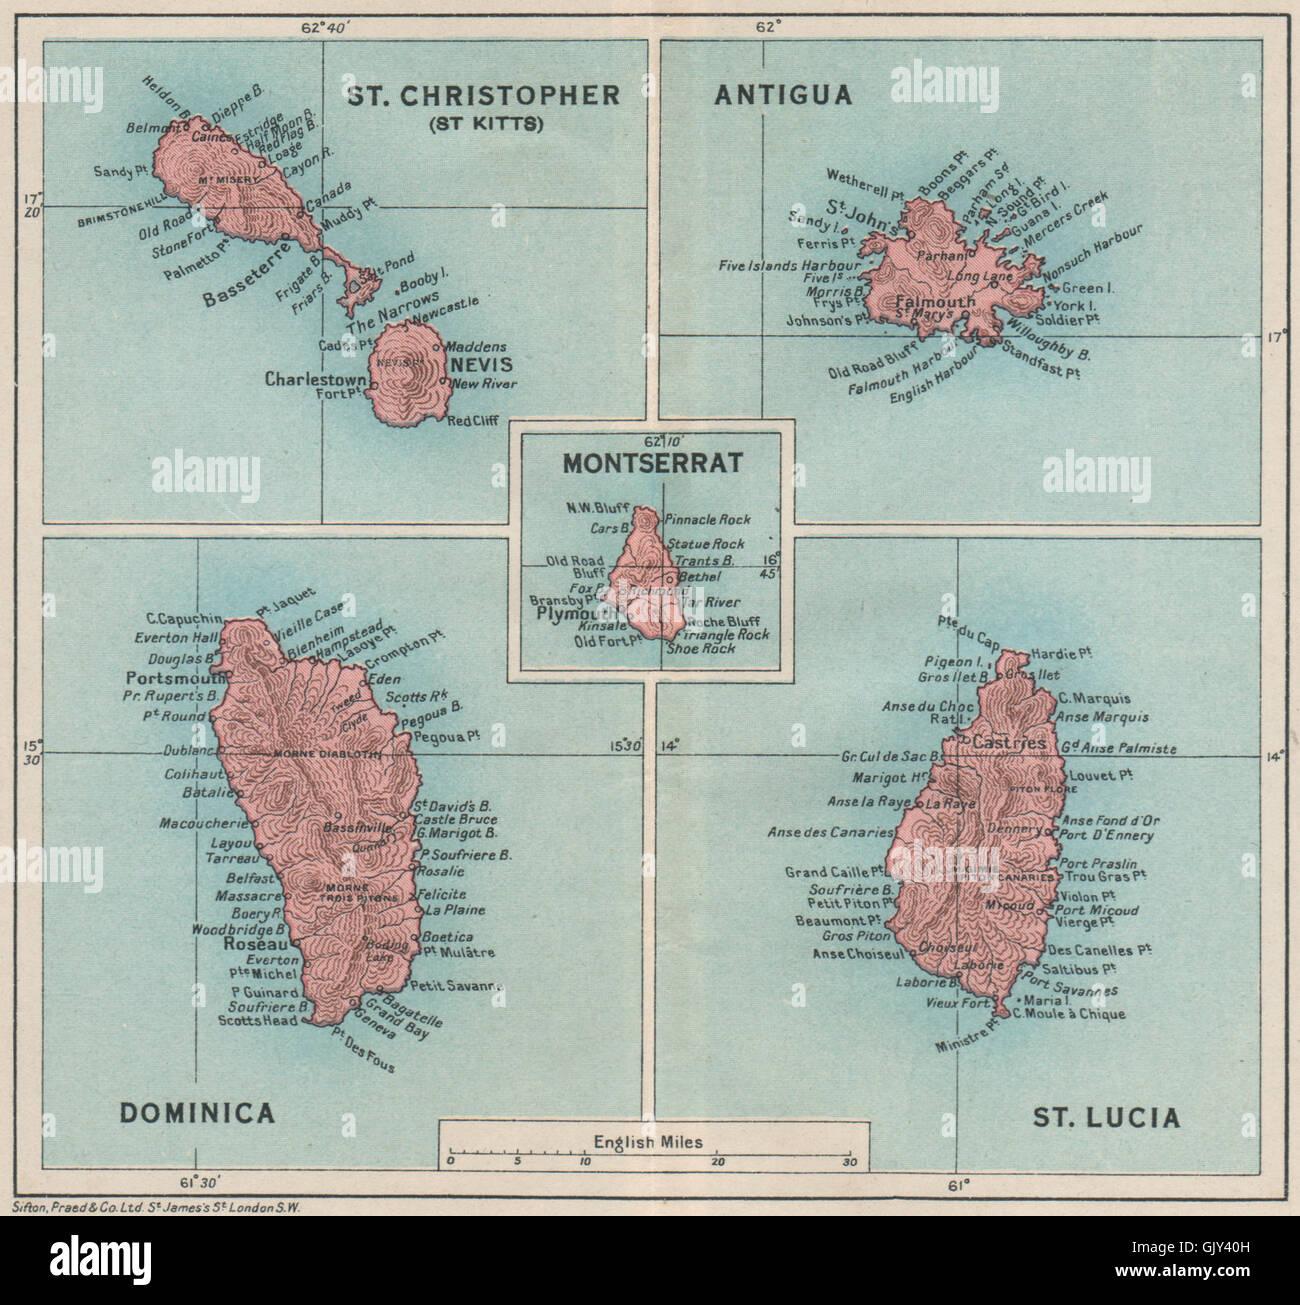 WEST INDIES Dominica St Kitts Antigua St Lucia Montserrat 1927